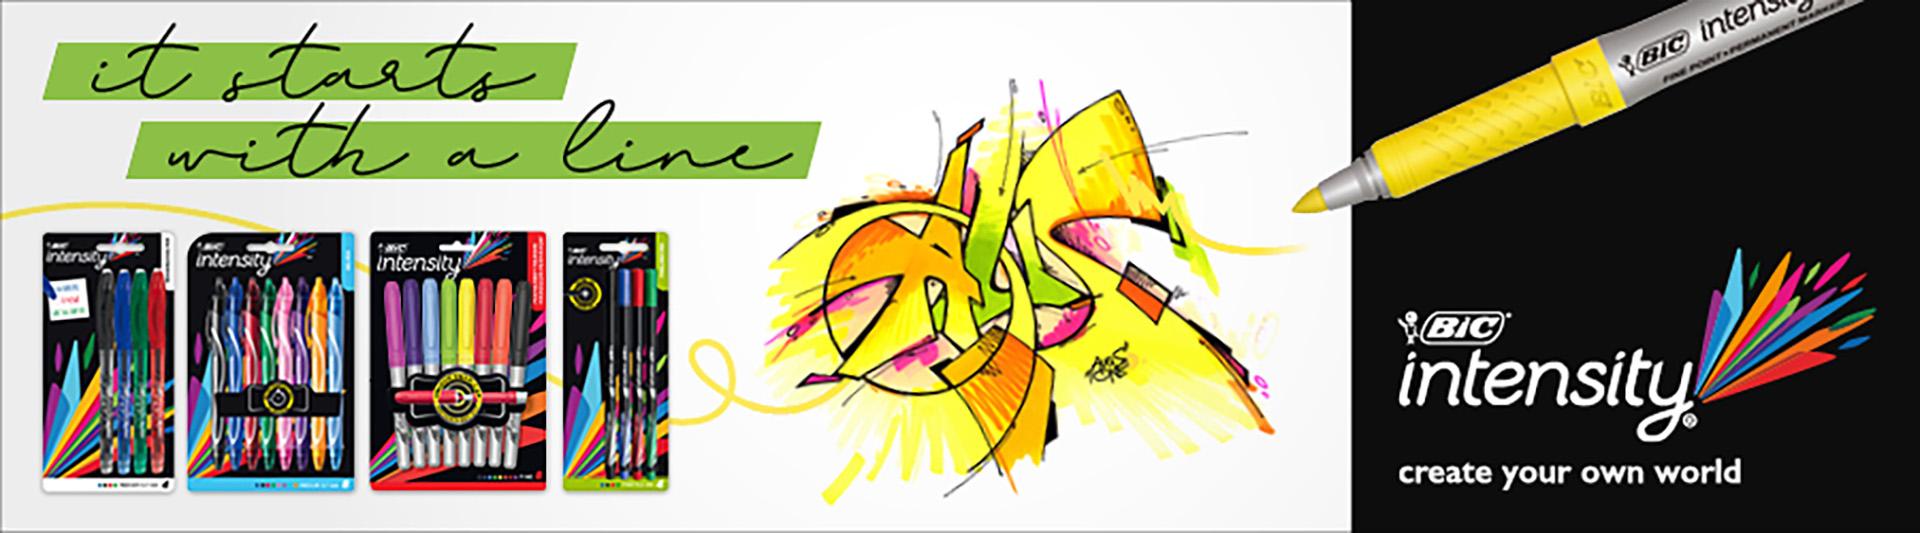 Kampagne, Testimonial, Graffiti, Design, BIC, Intensity, Auckz, Stifte, Pencil, Marker, Werbung, Bennet Grüttner, Auckz